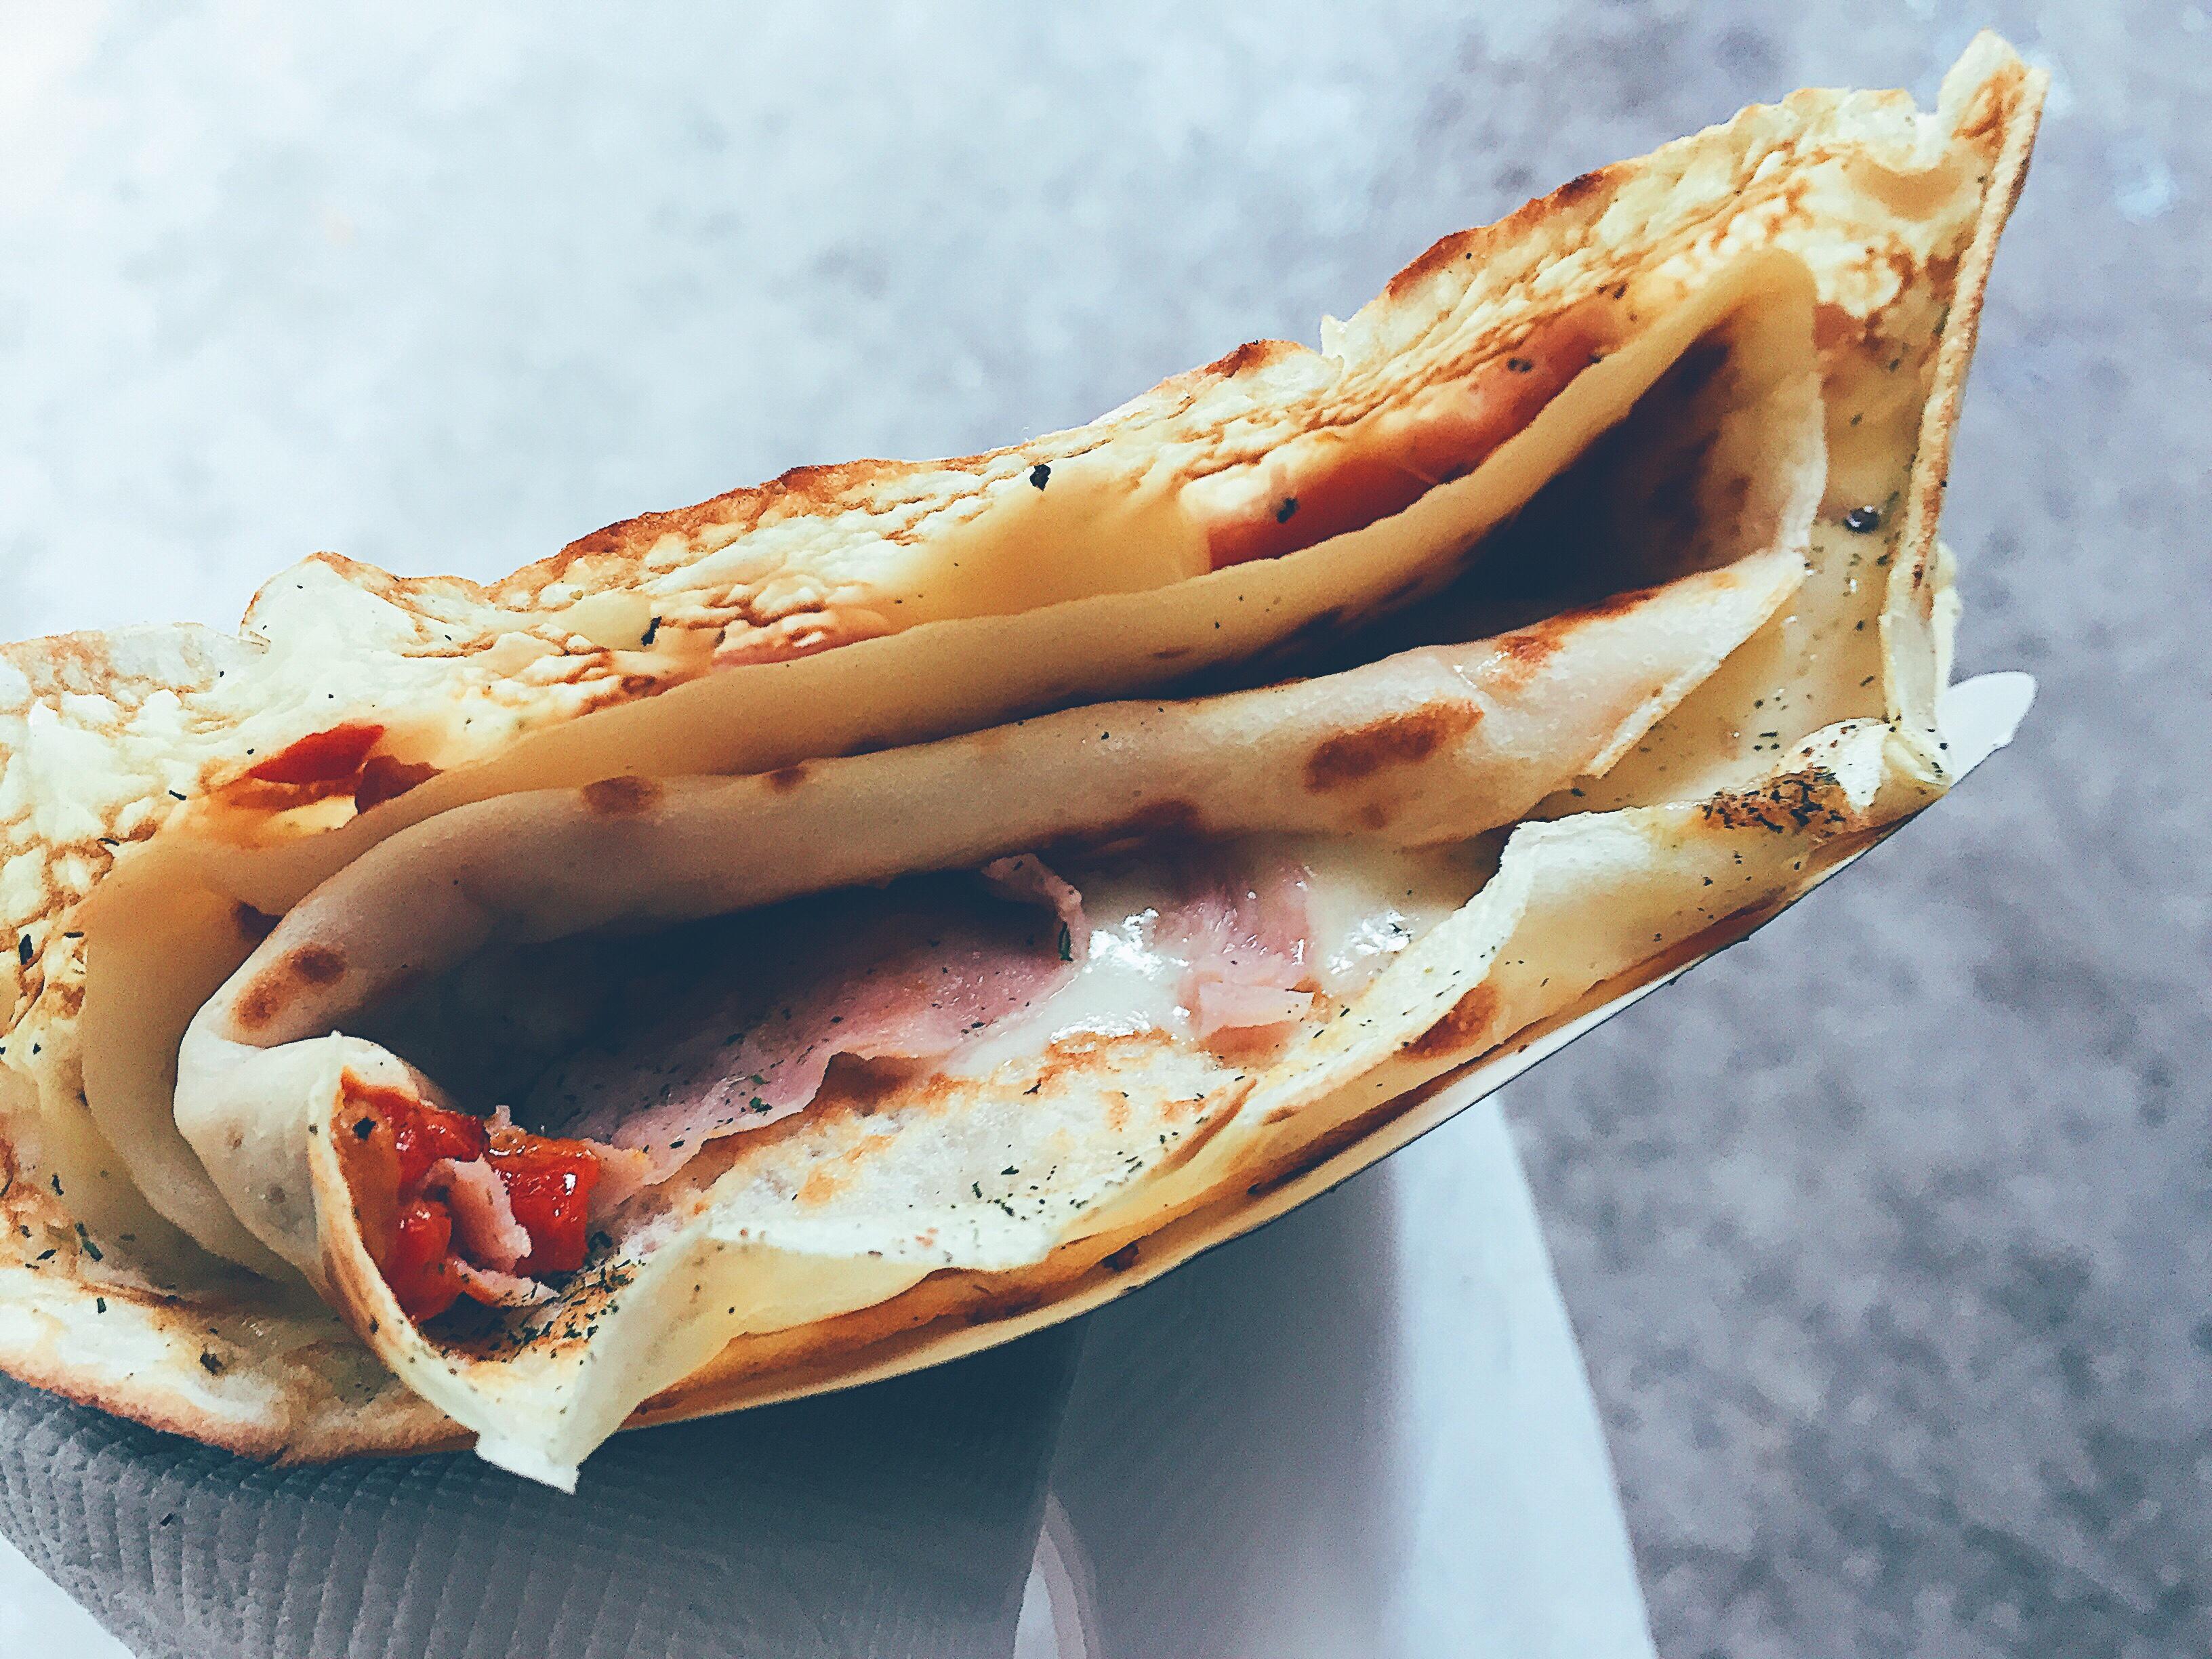 Crepe by Papito Pancake